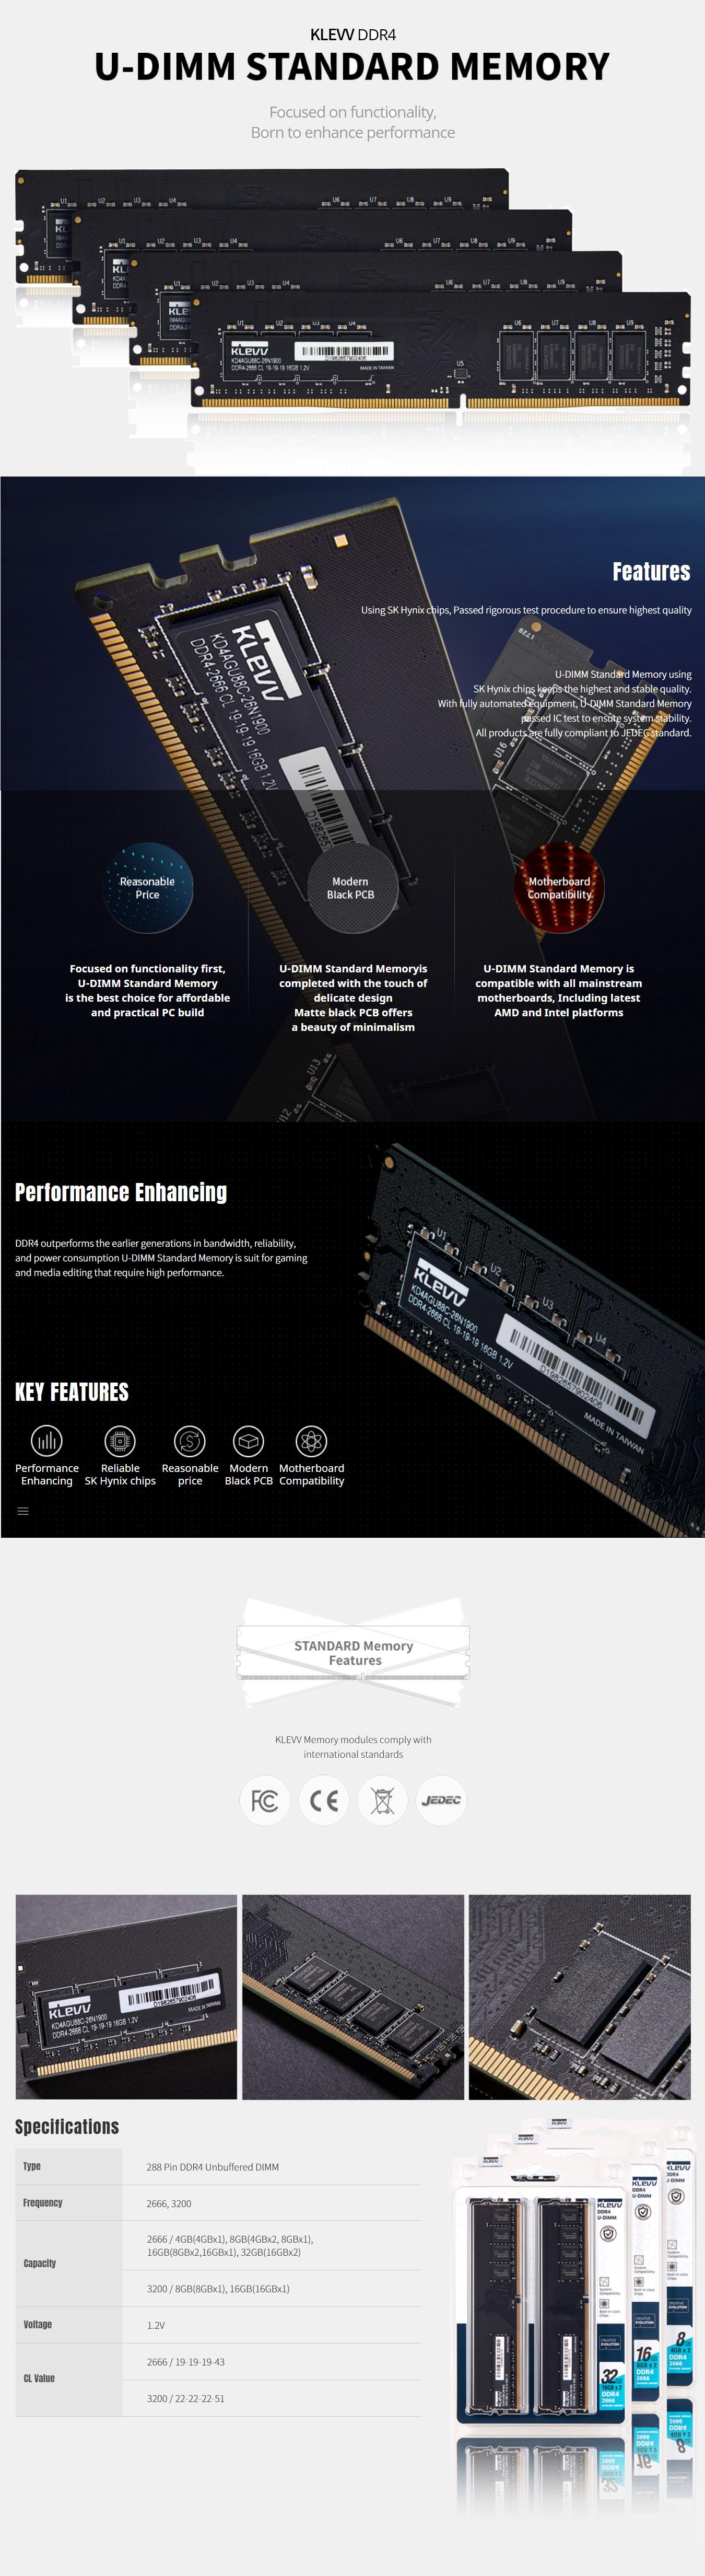 Klevv 8GB DDR4 U-DIMM 2666Mhz Standard Memory 3